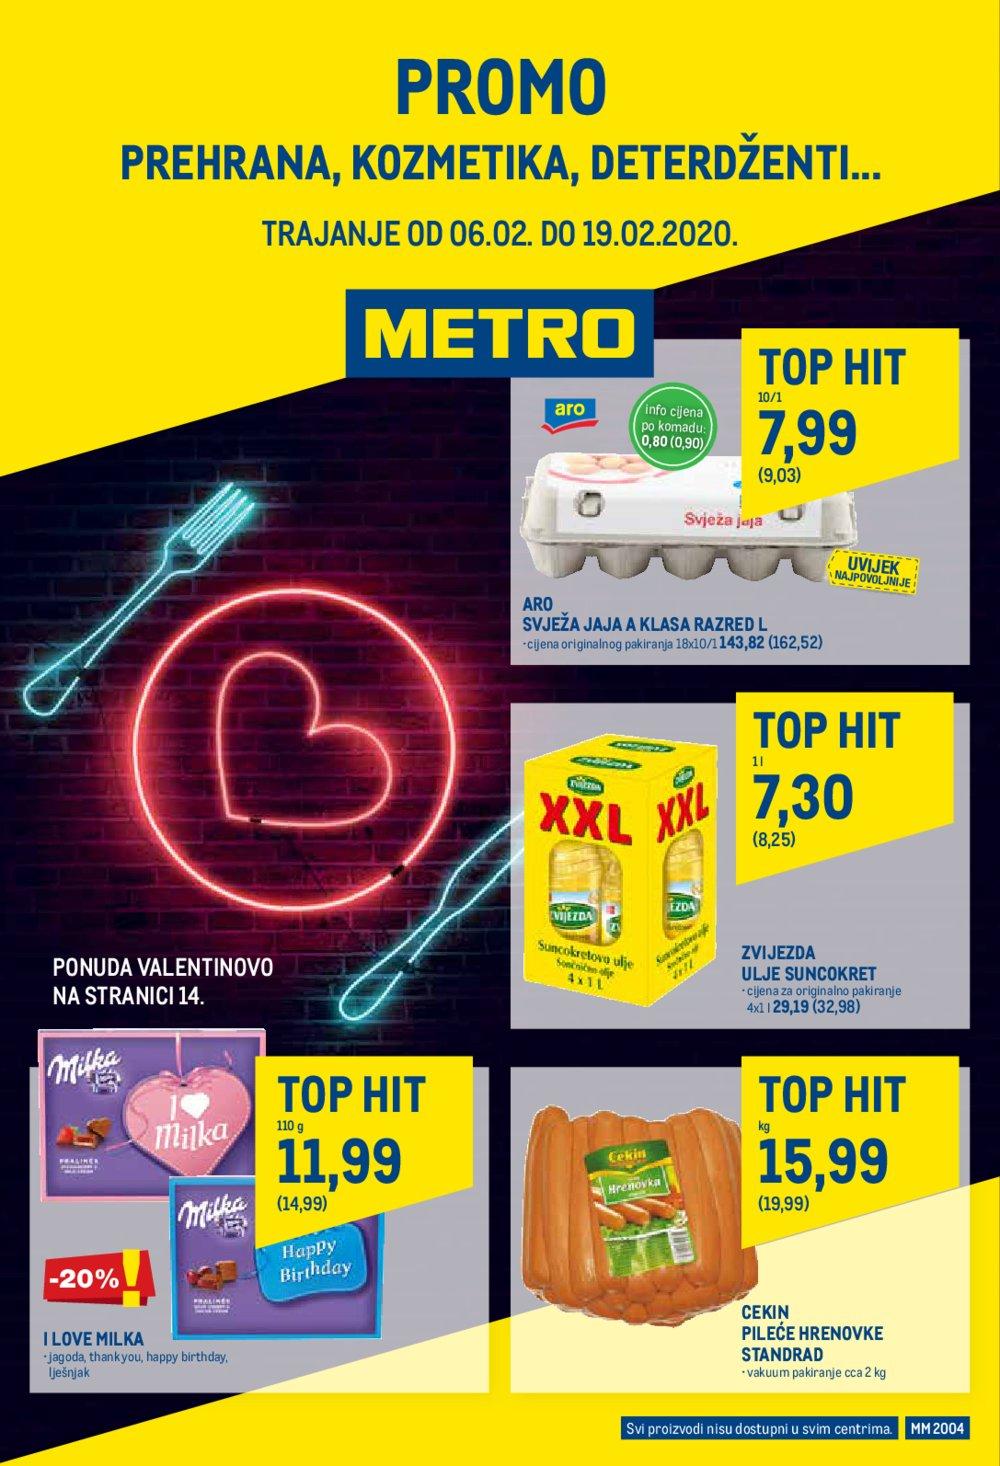 Metro katalog Akcija Posebna ponuda prehrane 06.02.-19.02.2020.